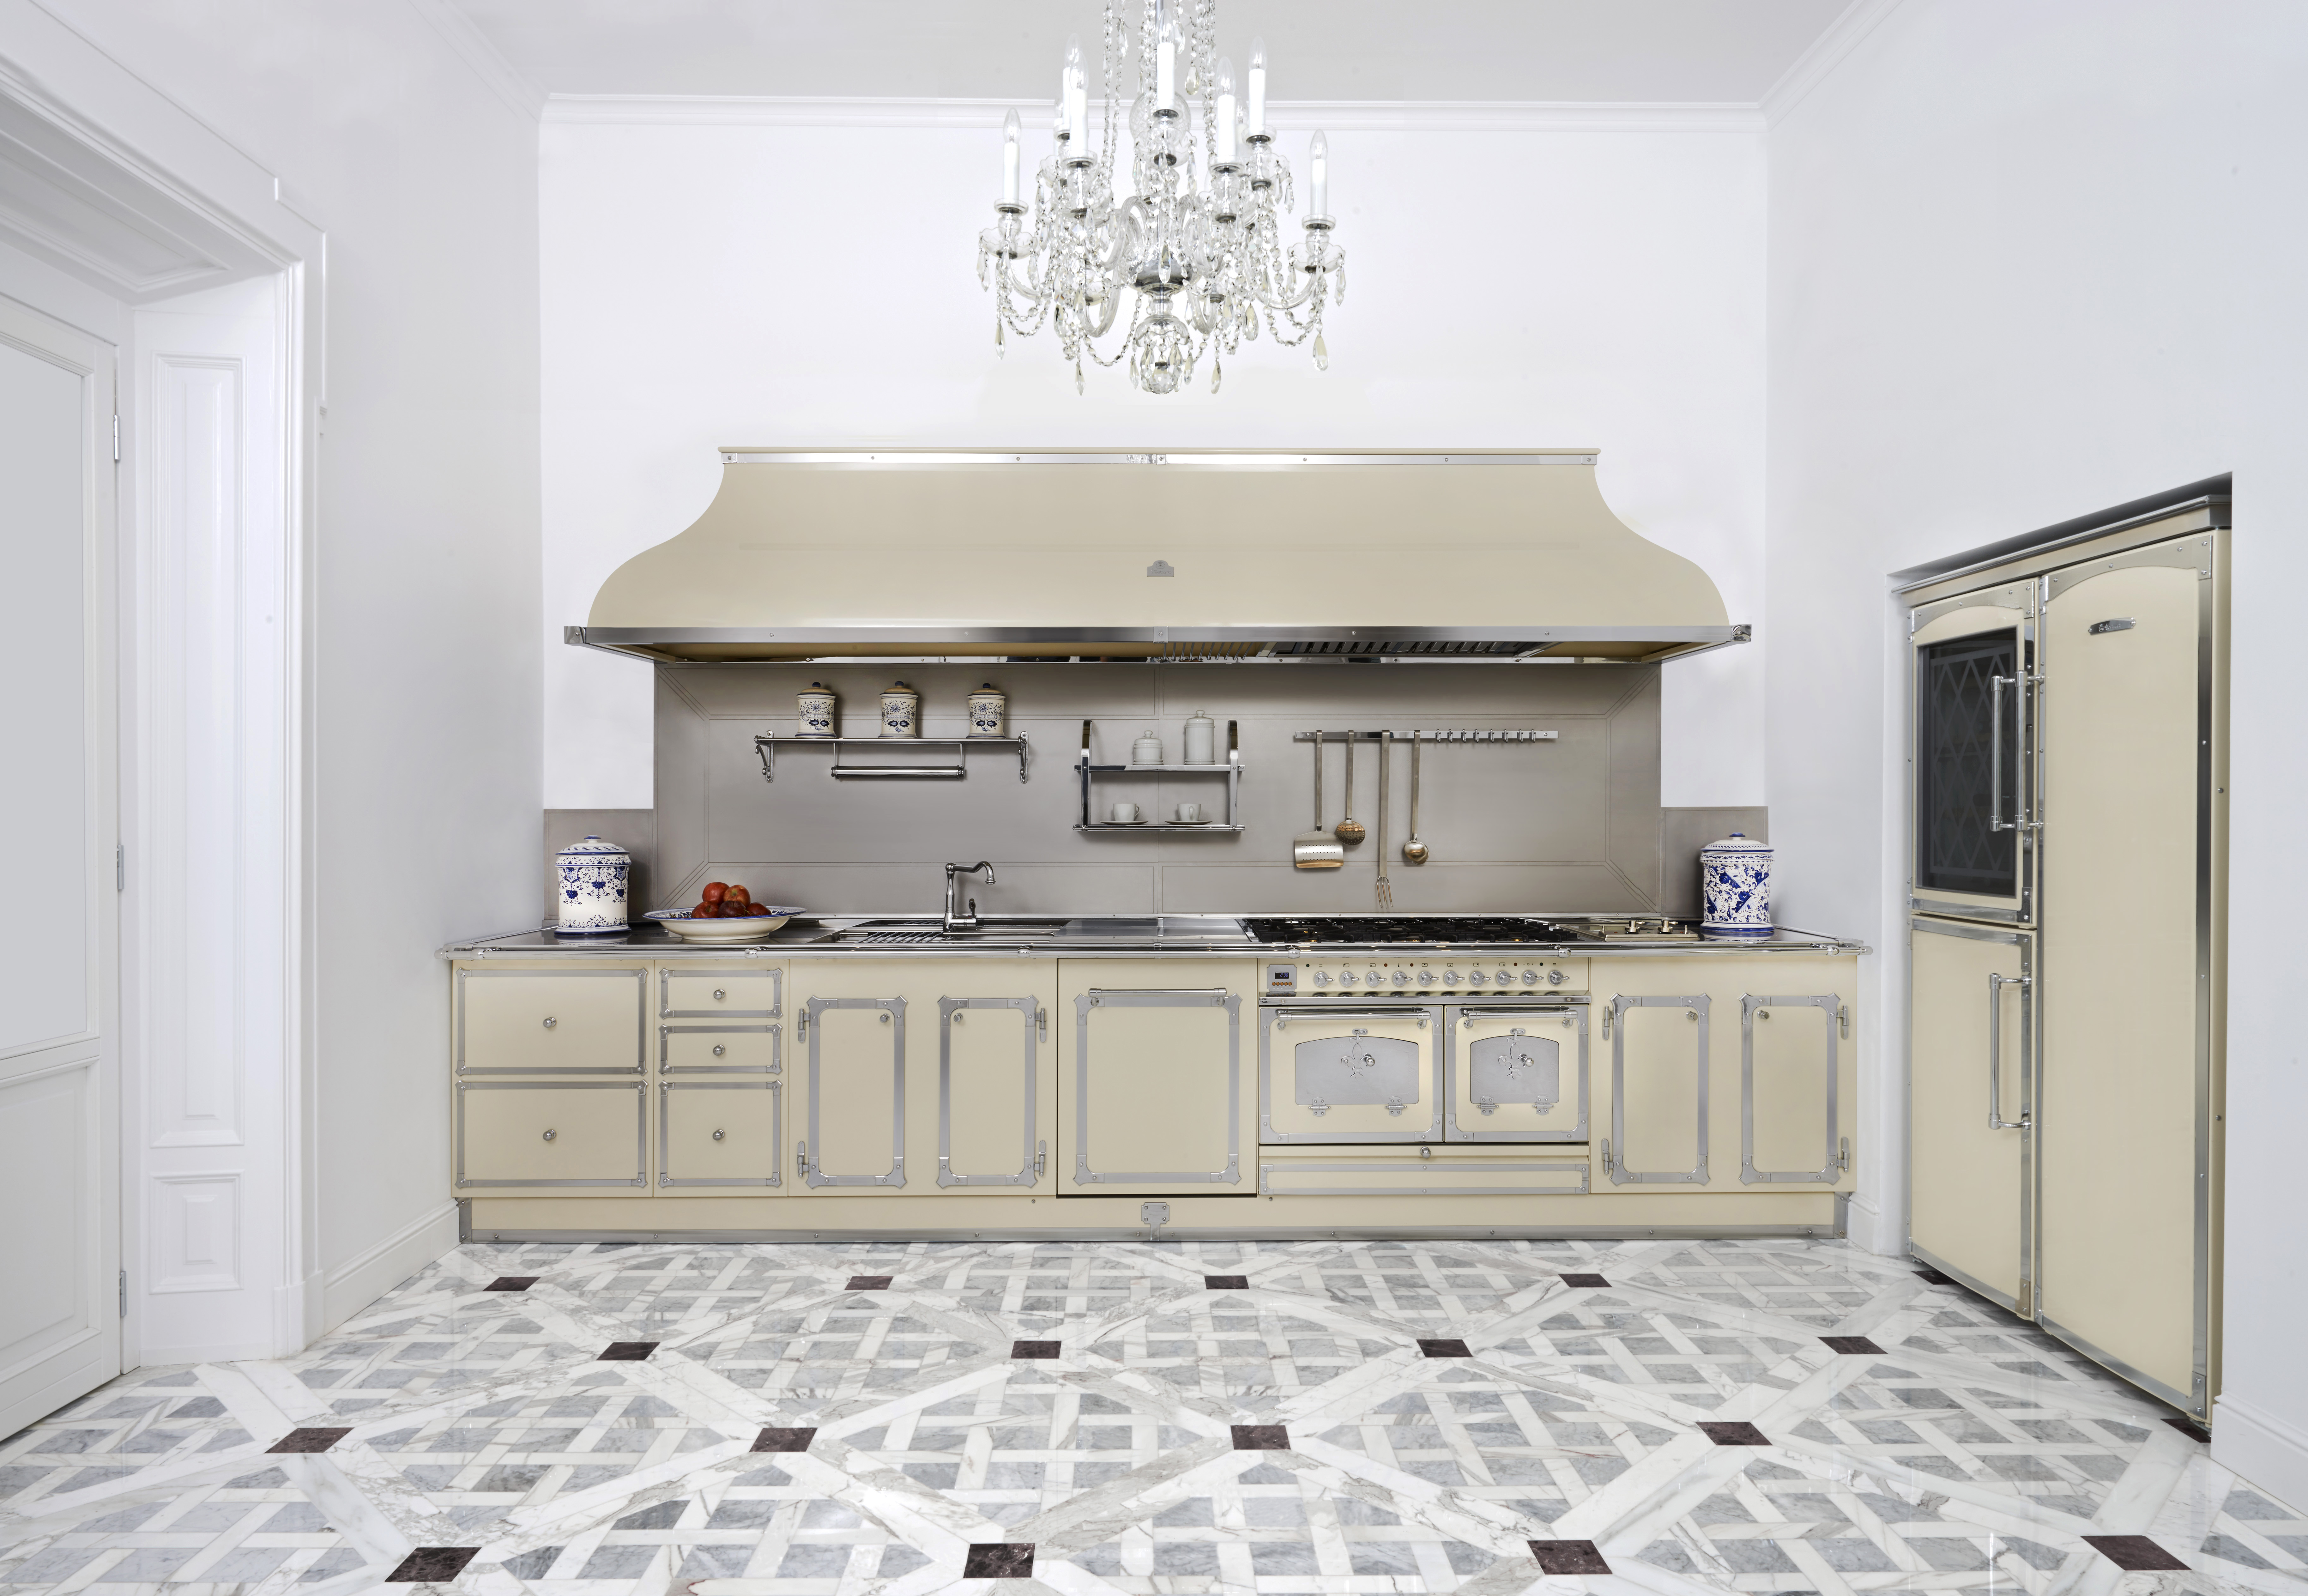 Florentine refinements for the kitchen - Home Appliances World